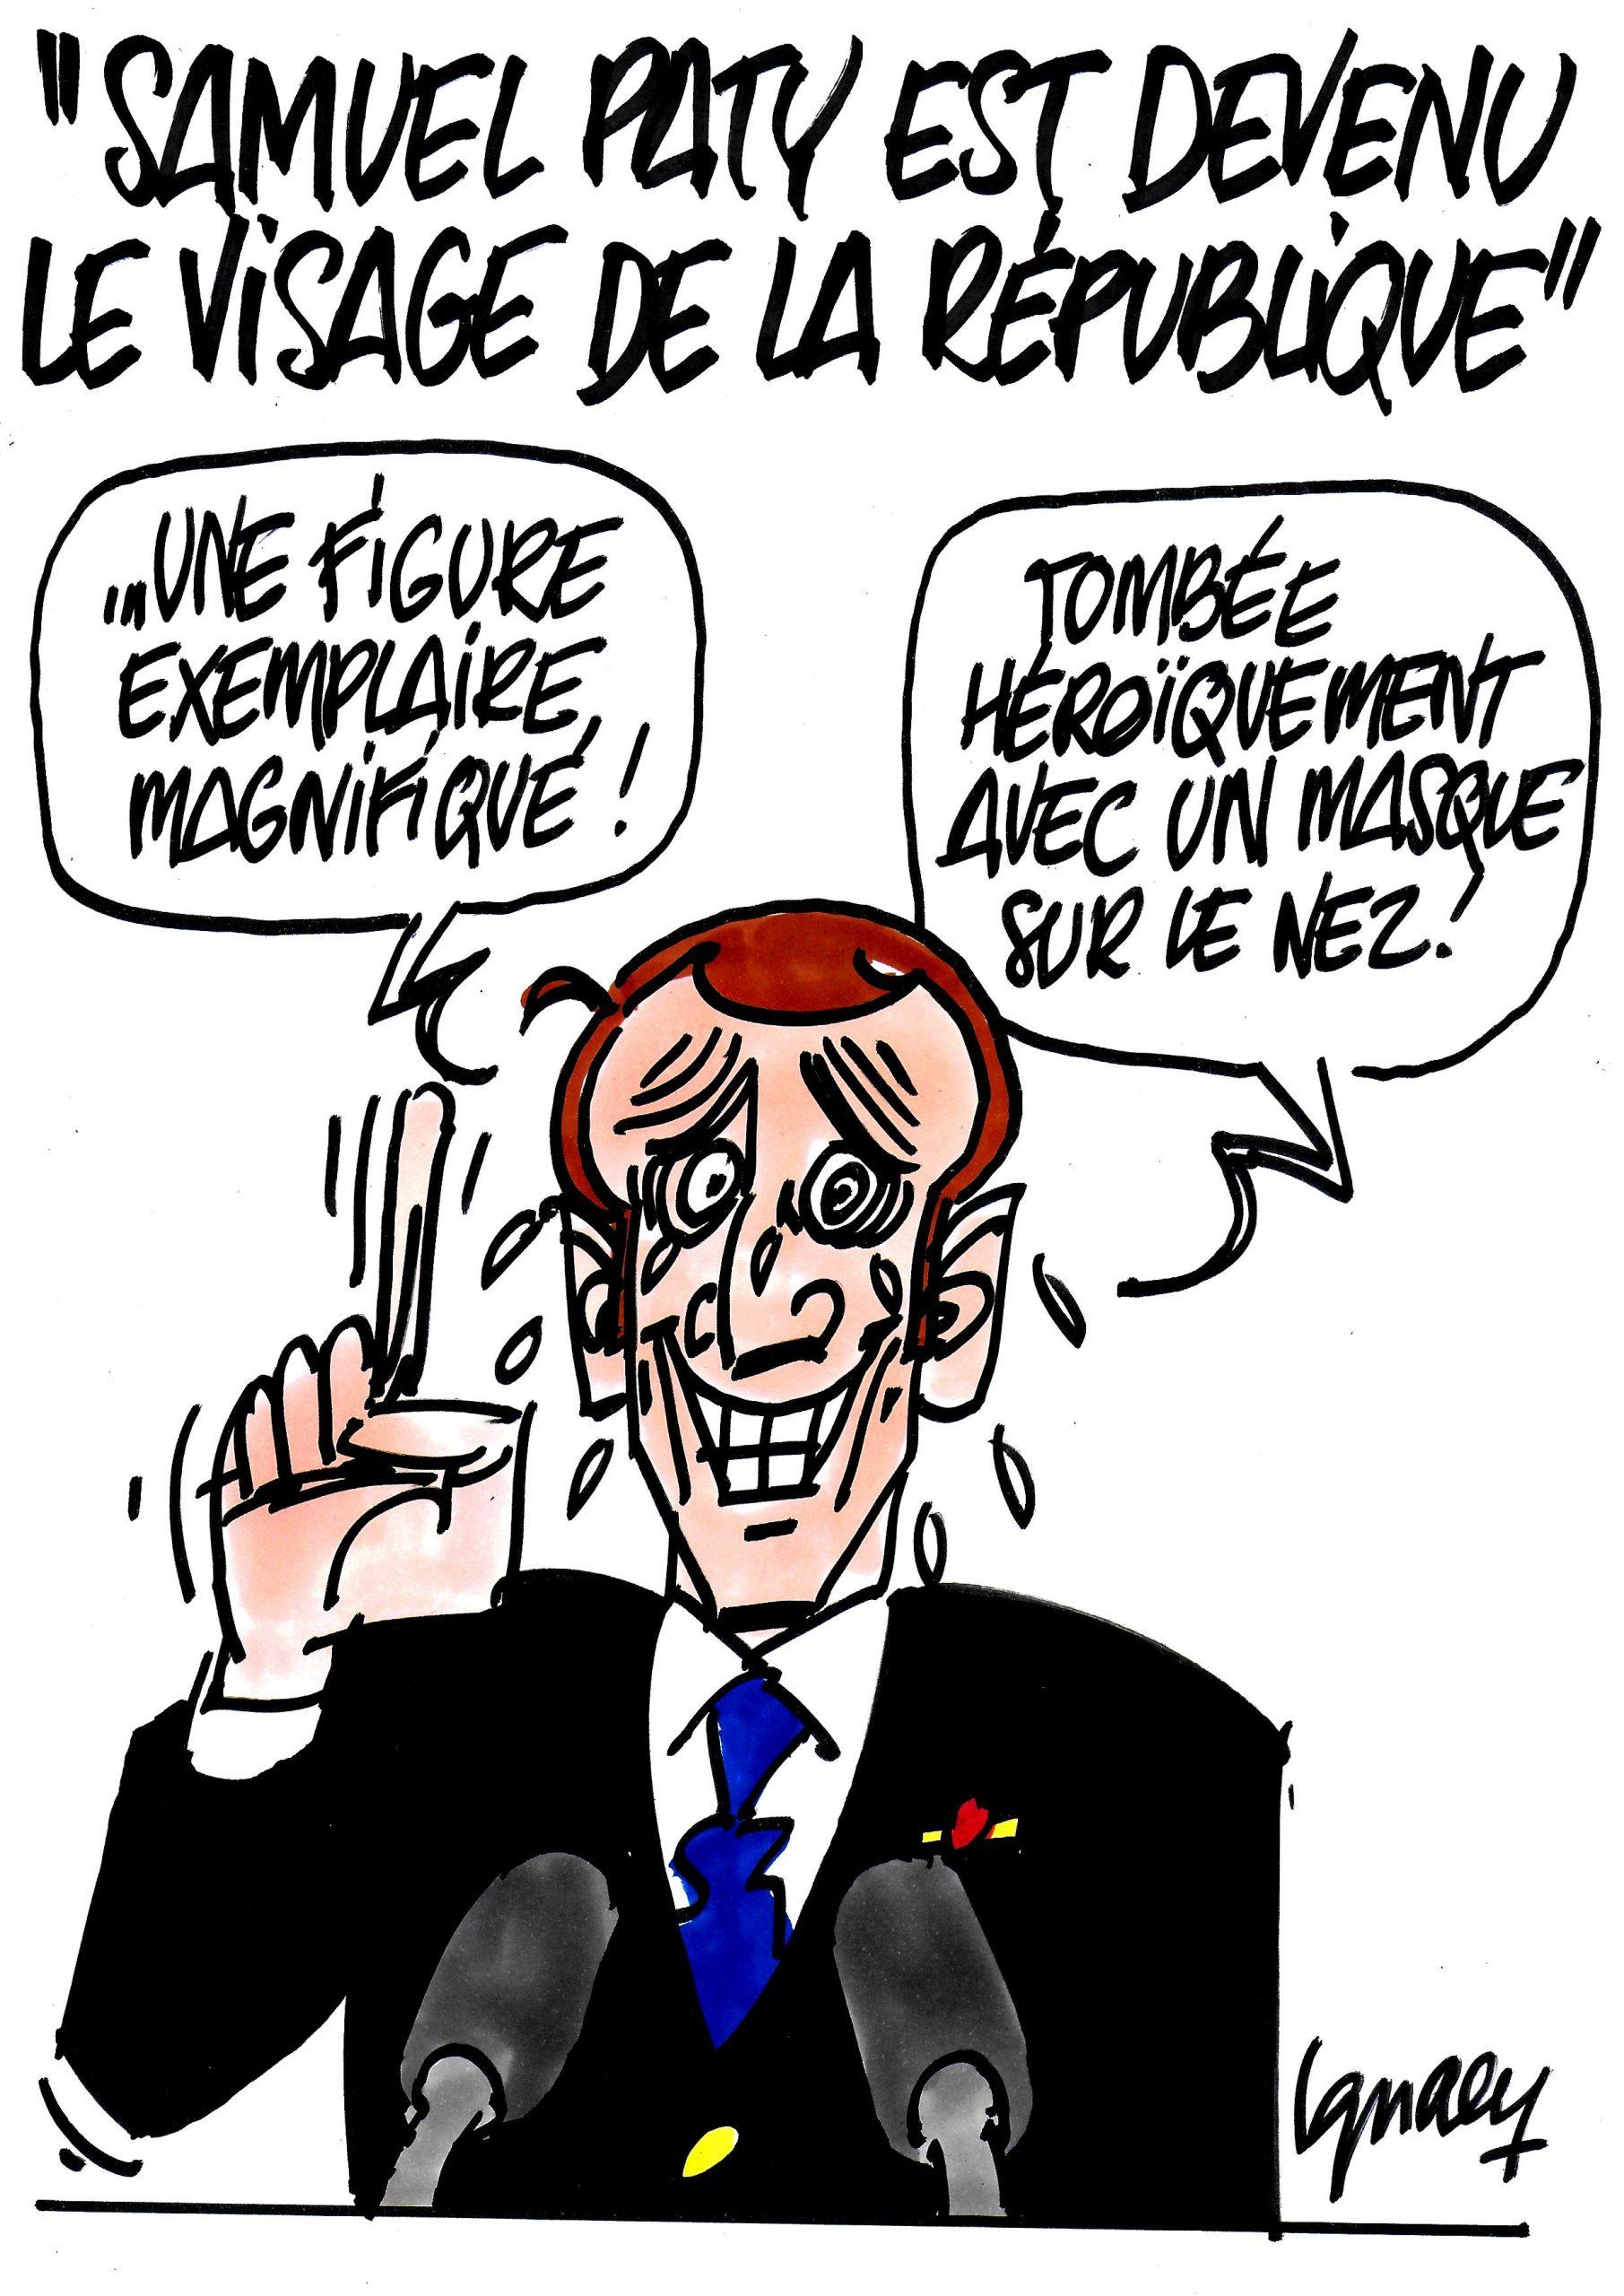 ignace_samuel_paty_figure_republique_macron_hommage-mpi